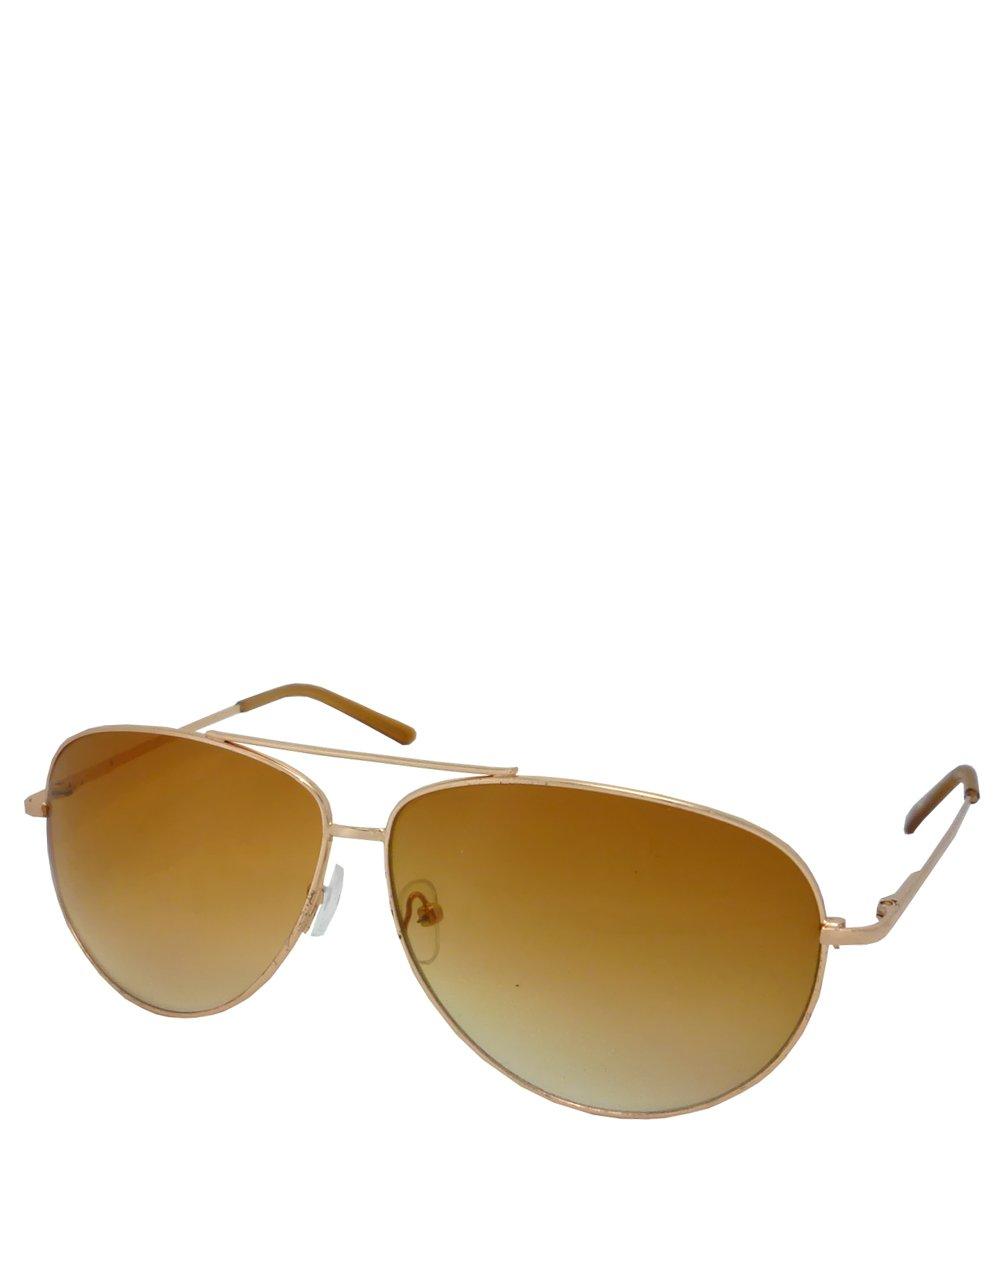 311bb66f70 The Big Lebowski Walter Sobchak Sunglasses